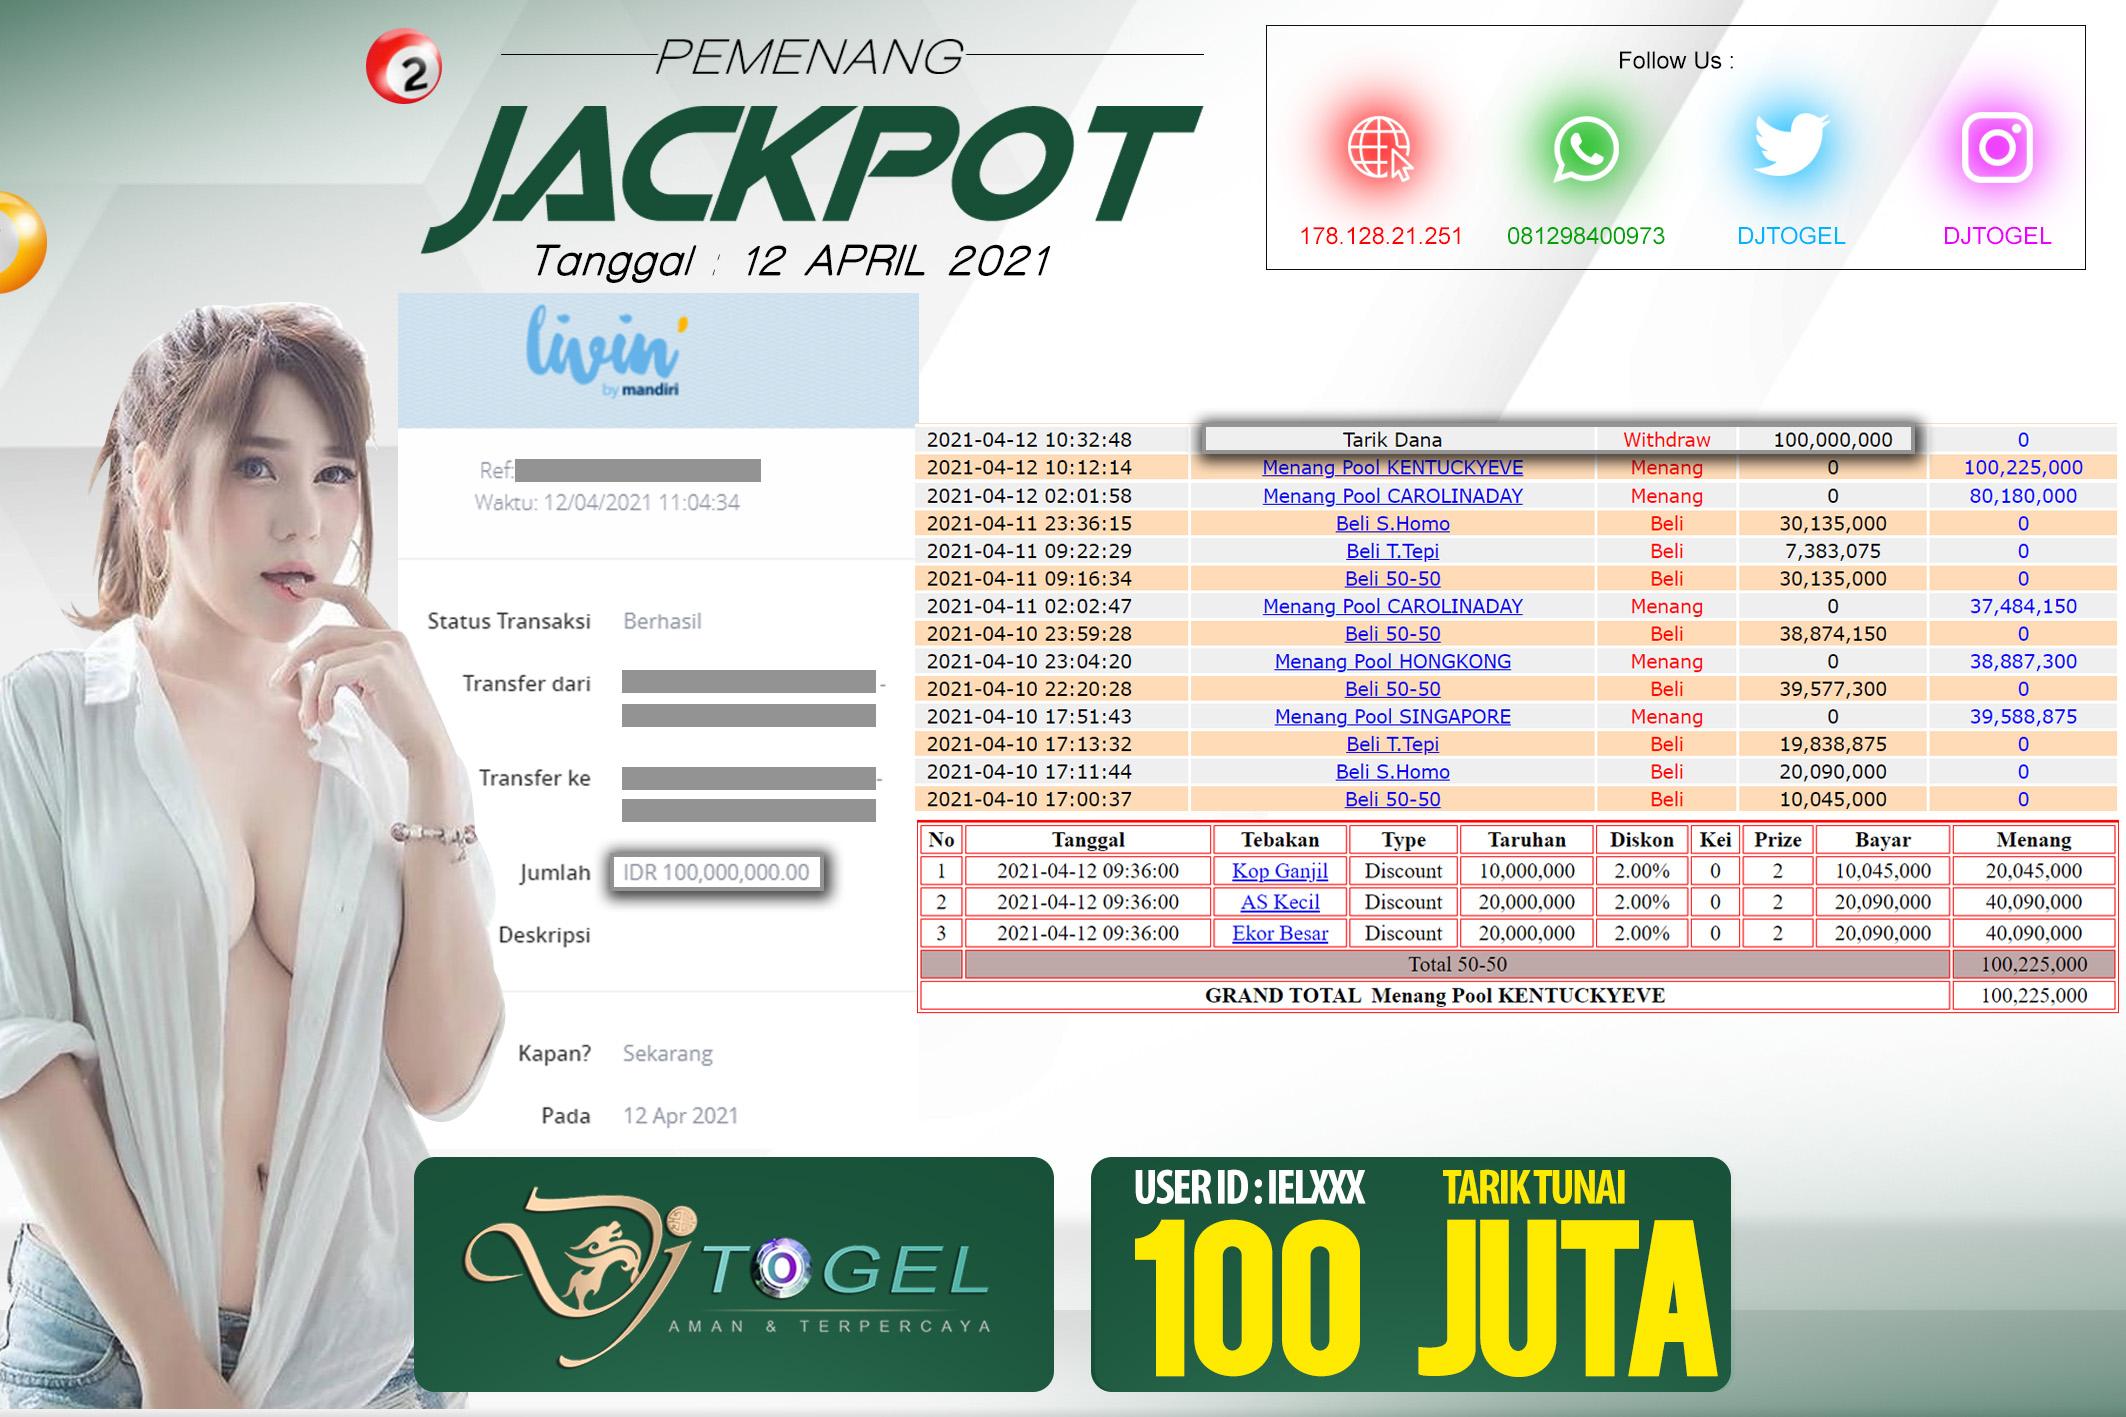 Aplikasi Togel Jackpot